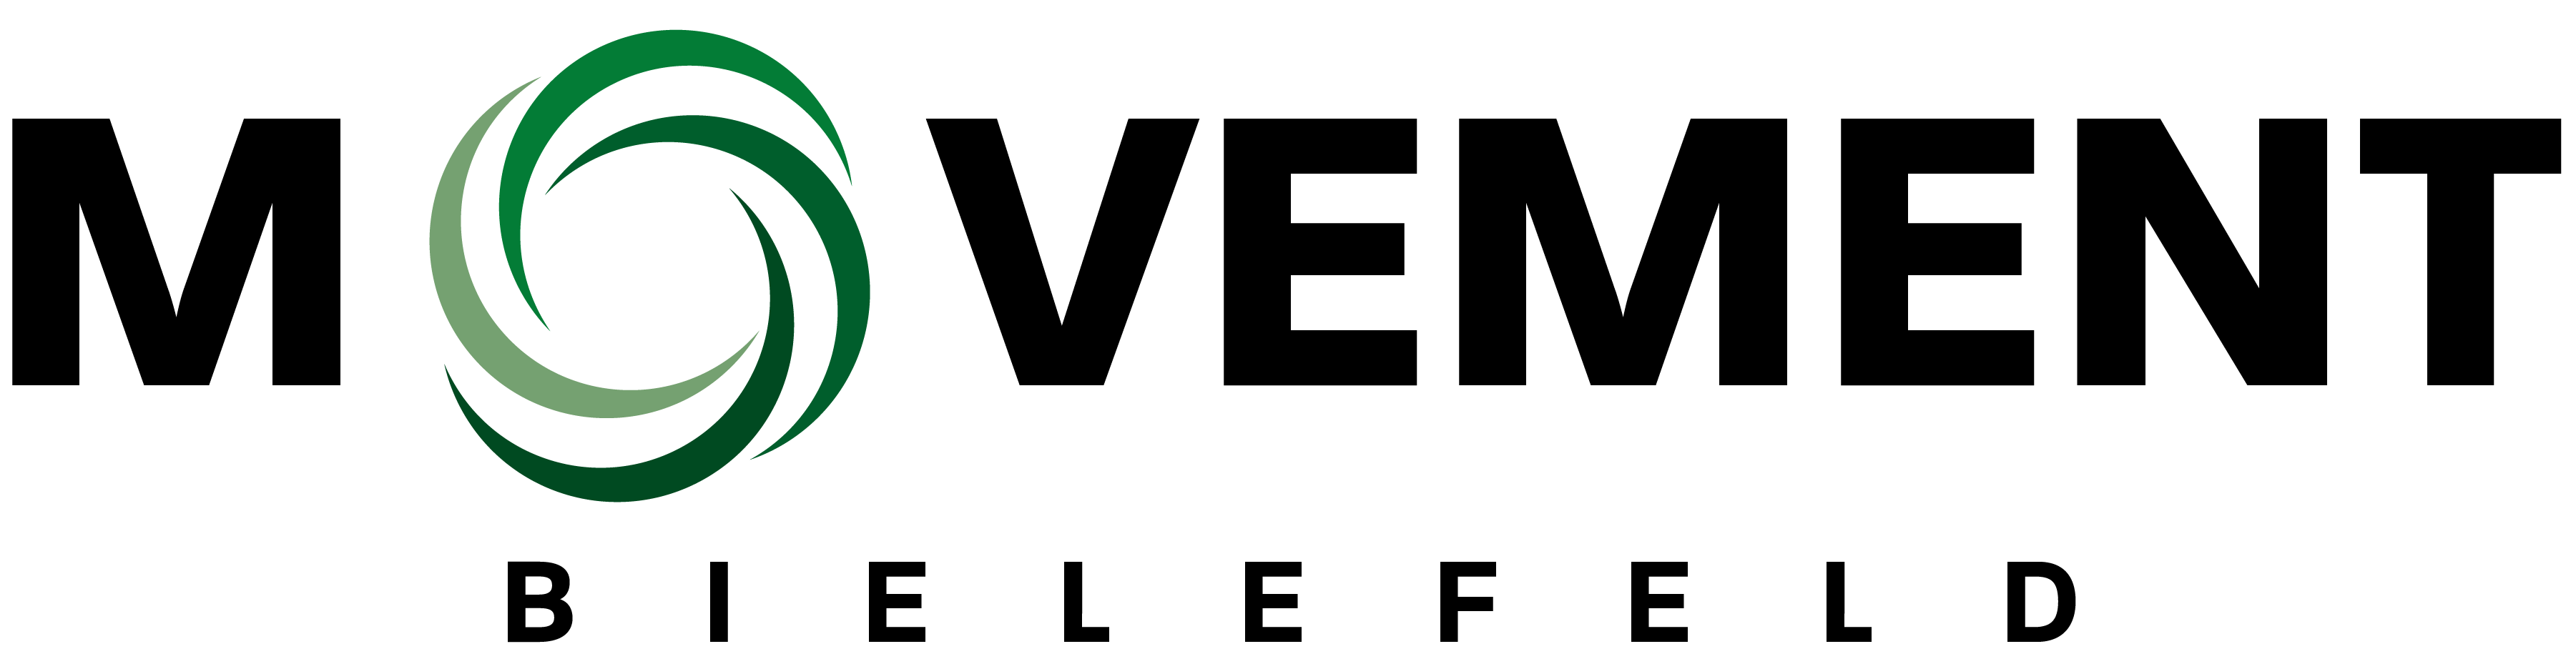 MOVEMENT_LOGO_BLACKGREEN_CMYK_TRANSPARENT